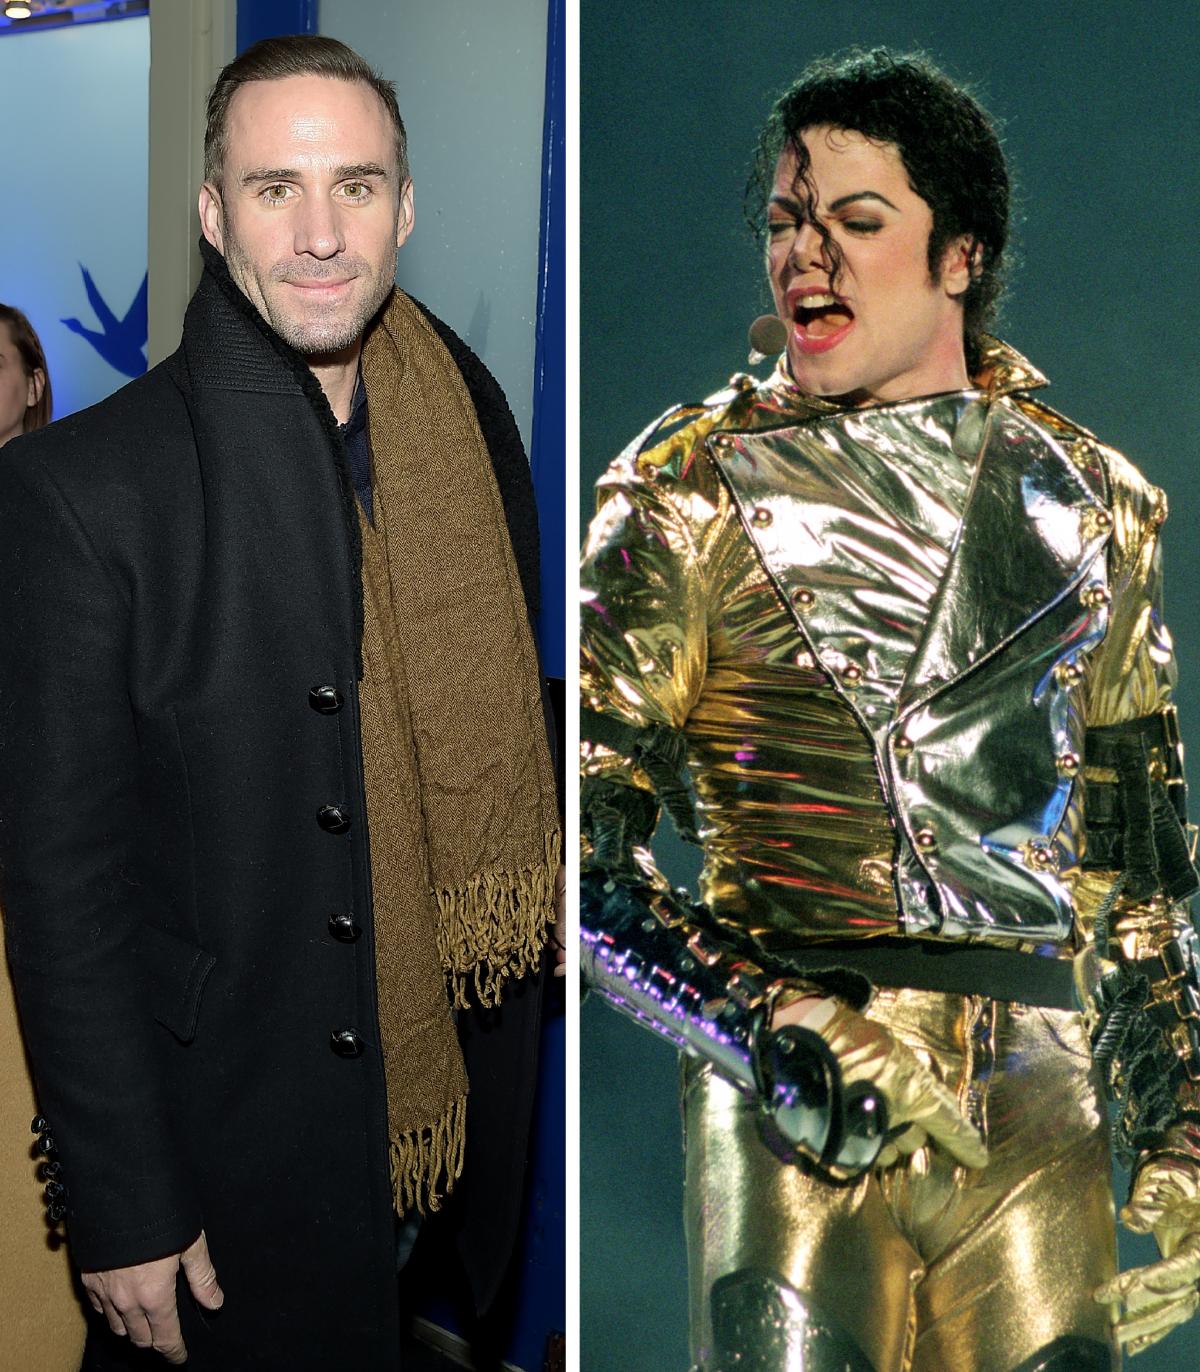 Joseph Fiennes, Michael Jackson